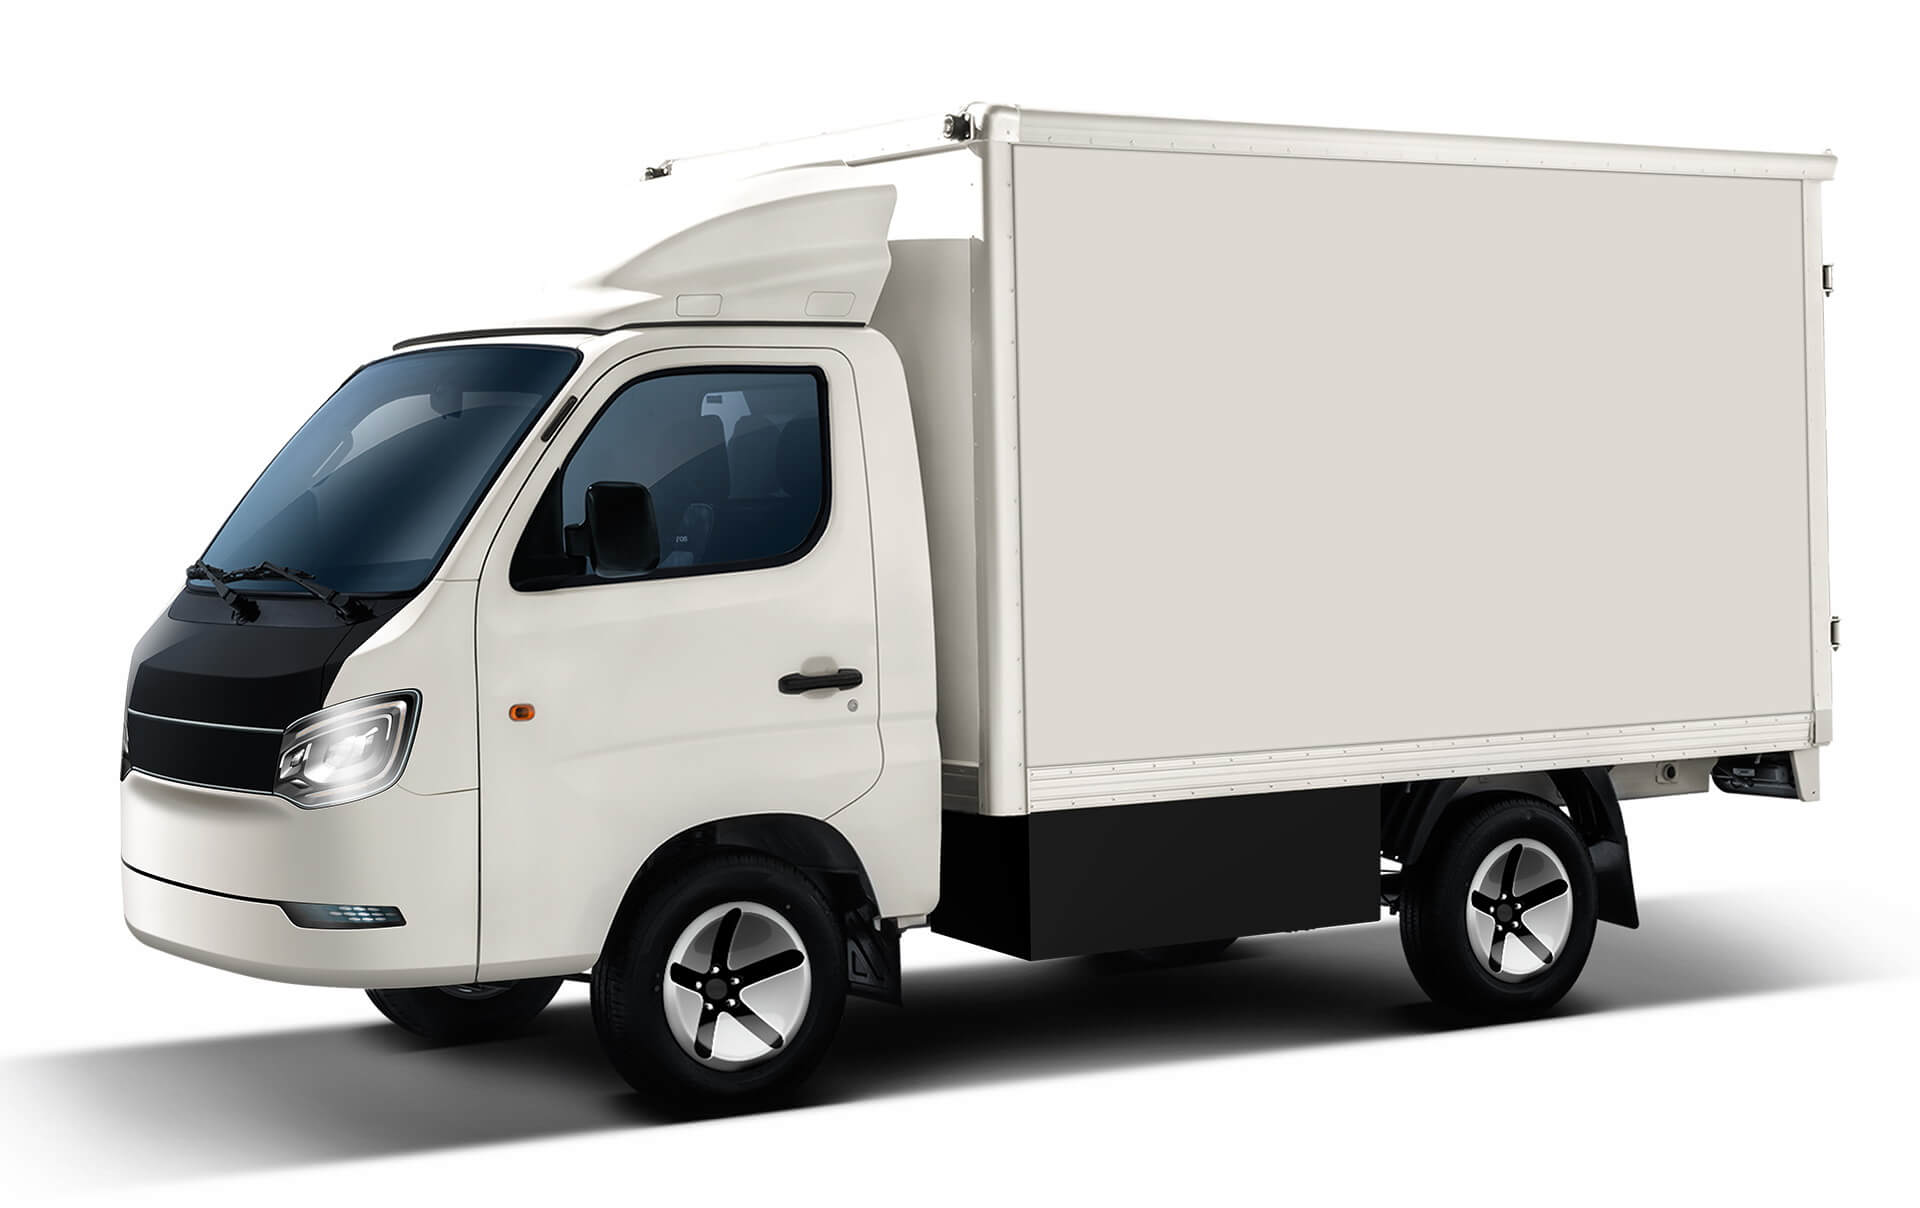 Электрический грузовик на суперконденсаторах Iona Truck - фото 2